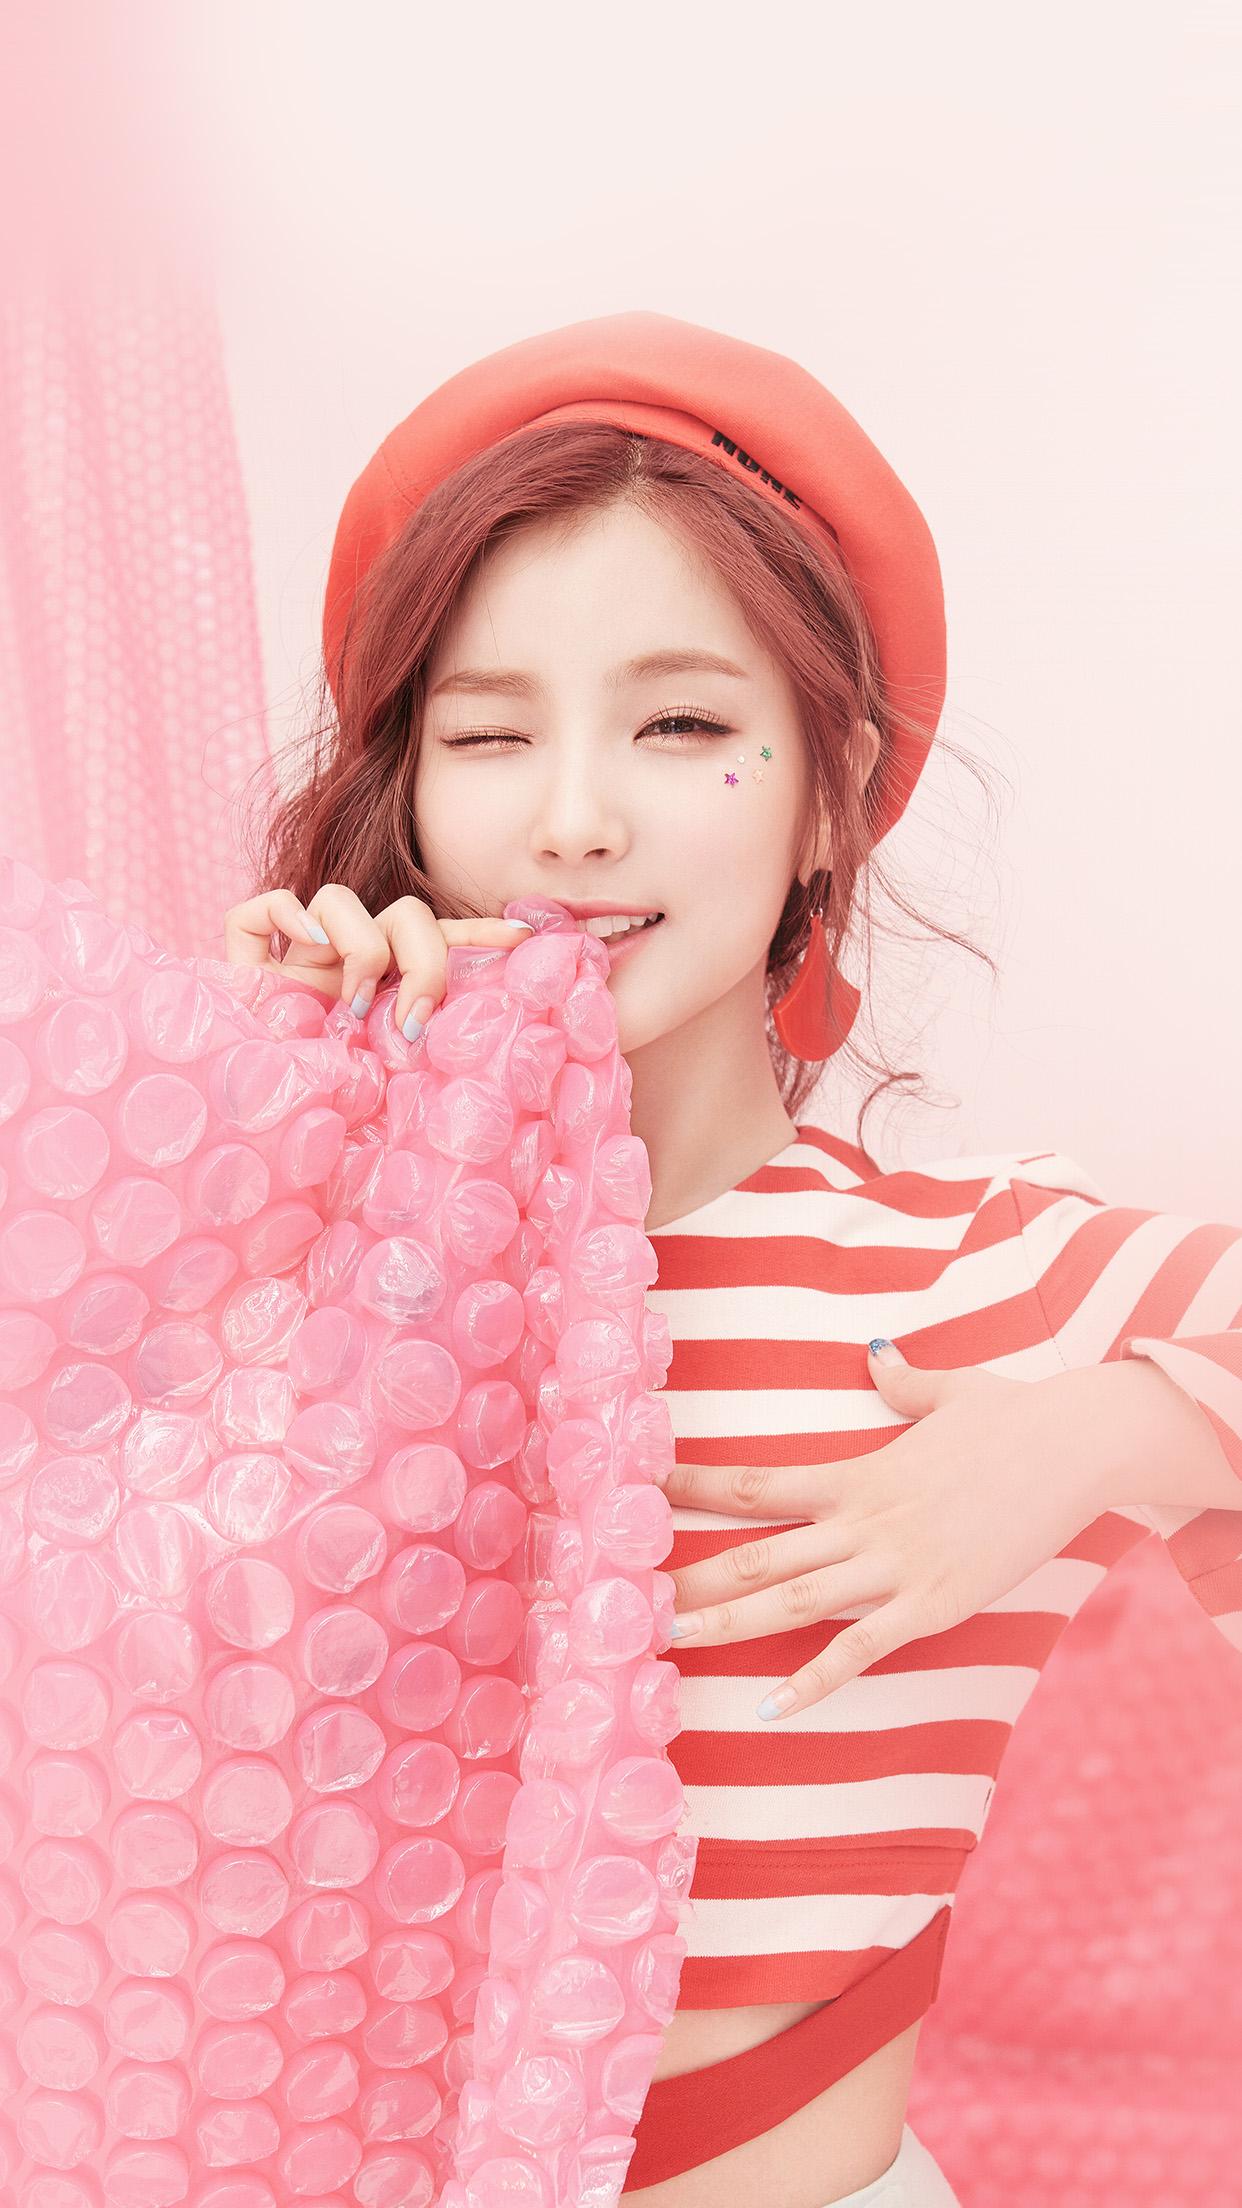 Kawaii Girl Wallpaper Ho25 Pink Asian Girl Cute Kpop Wallpaper